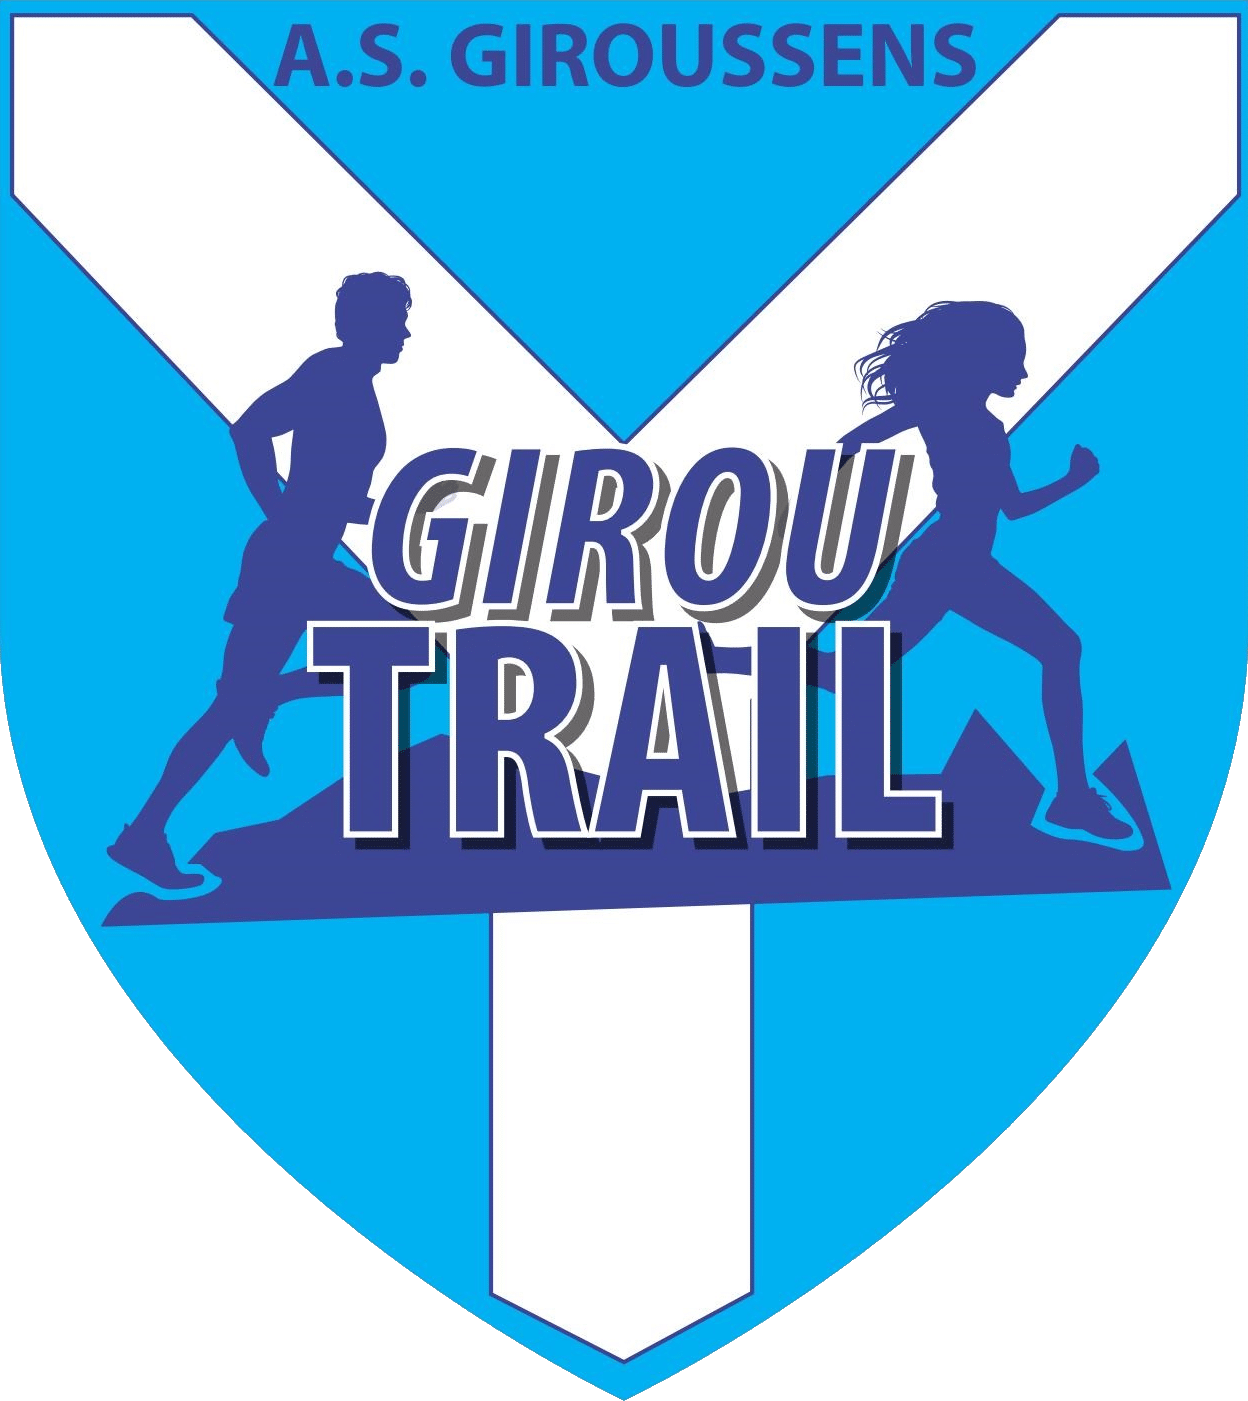 Le Girou Trail